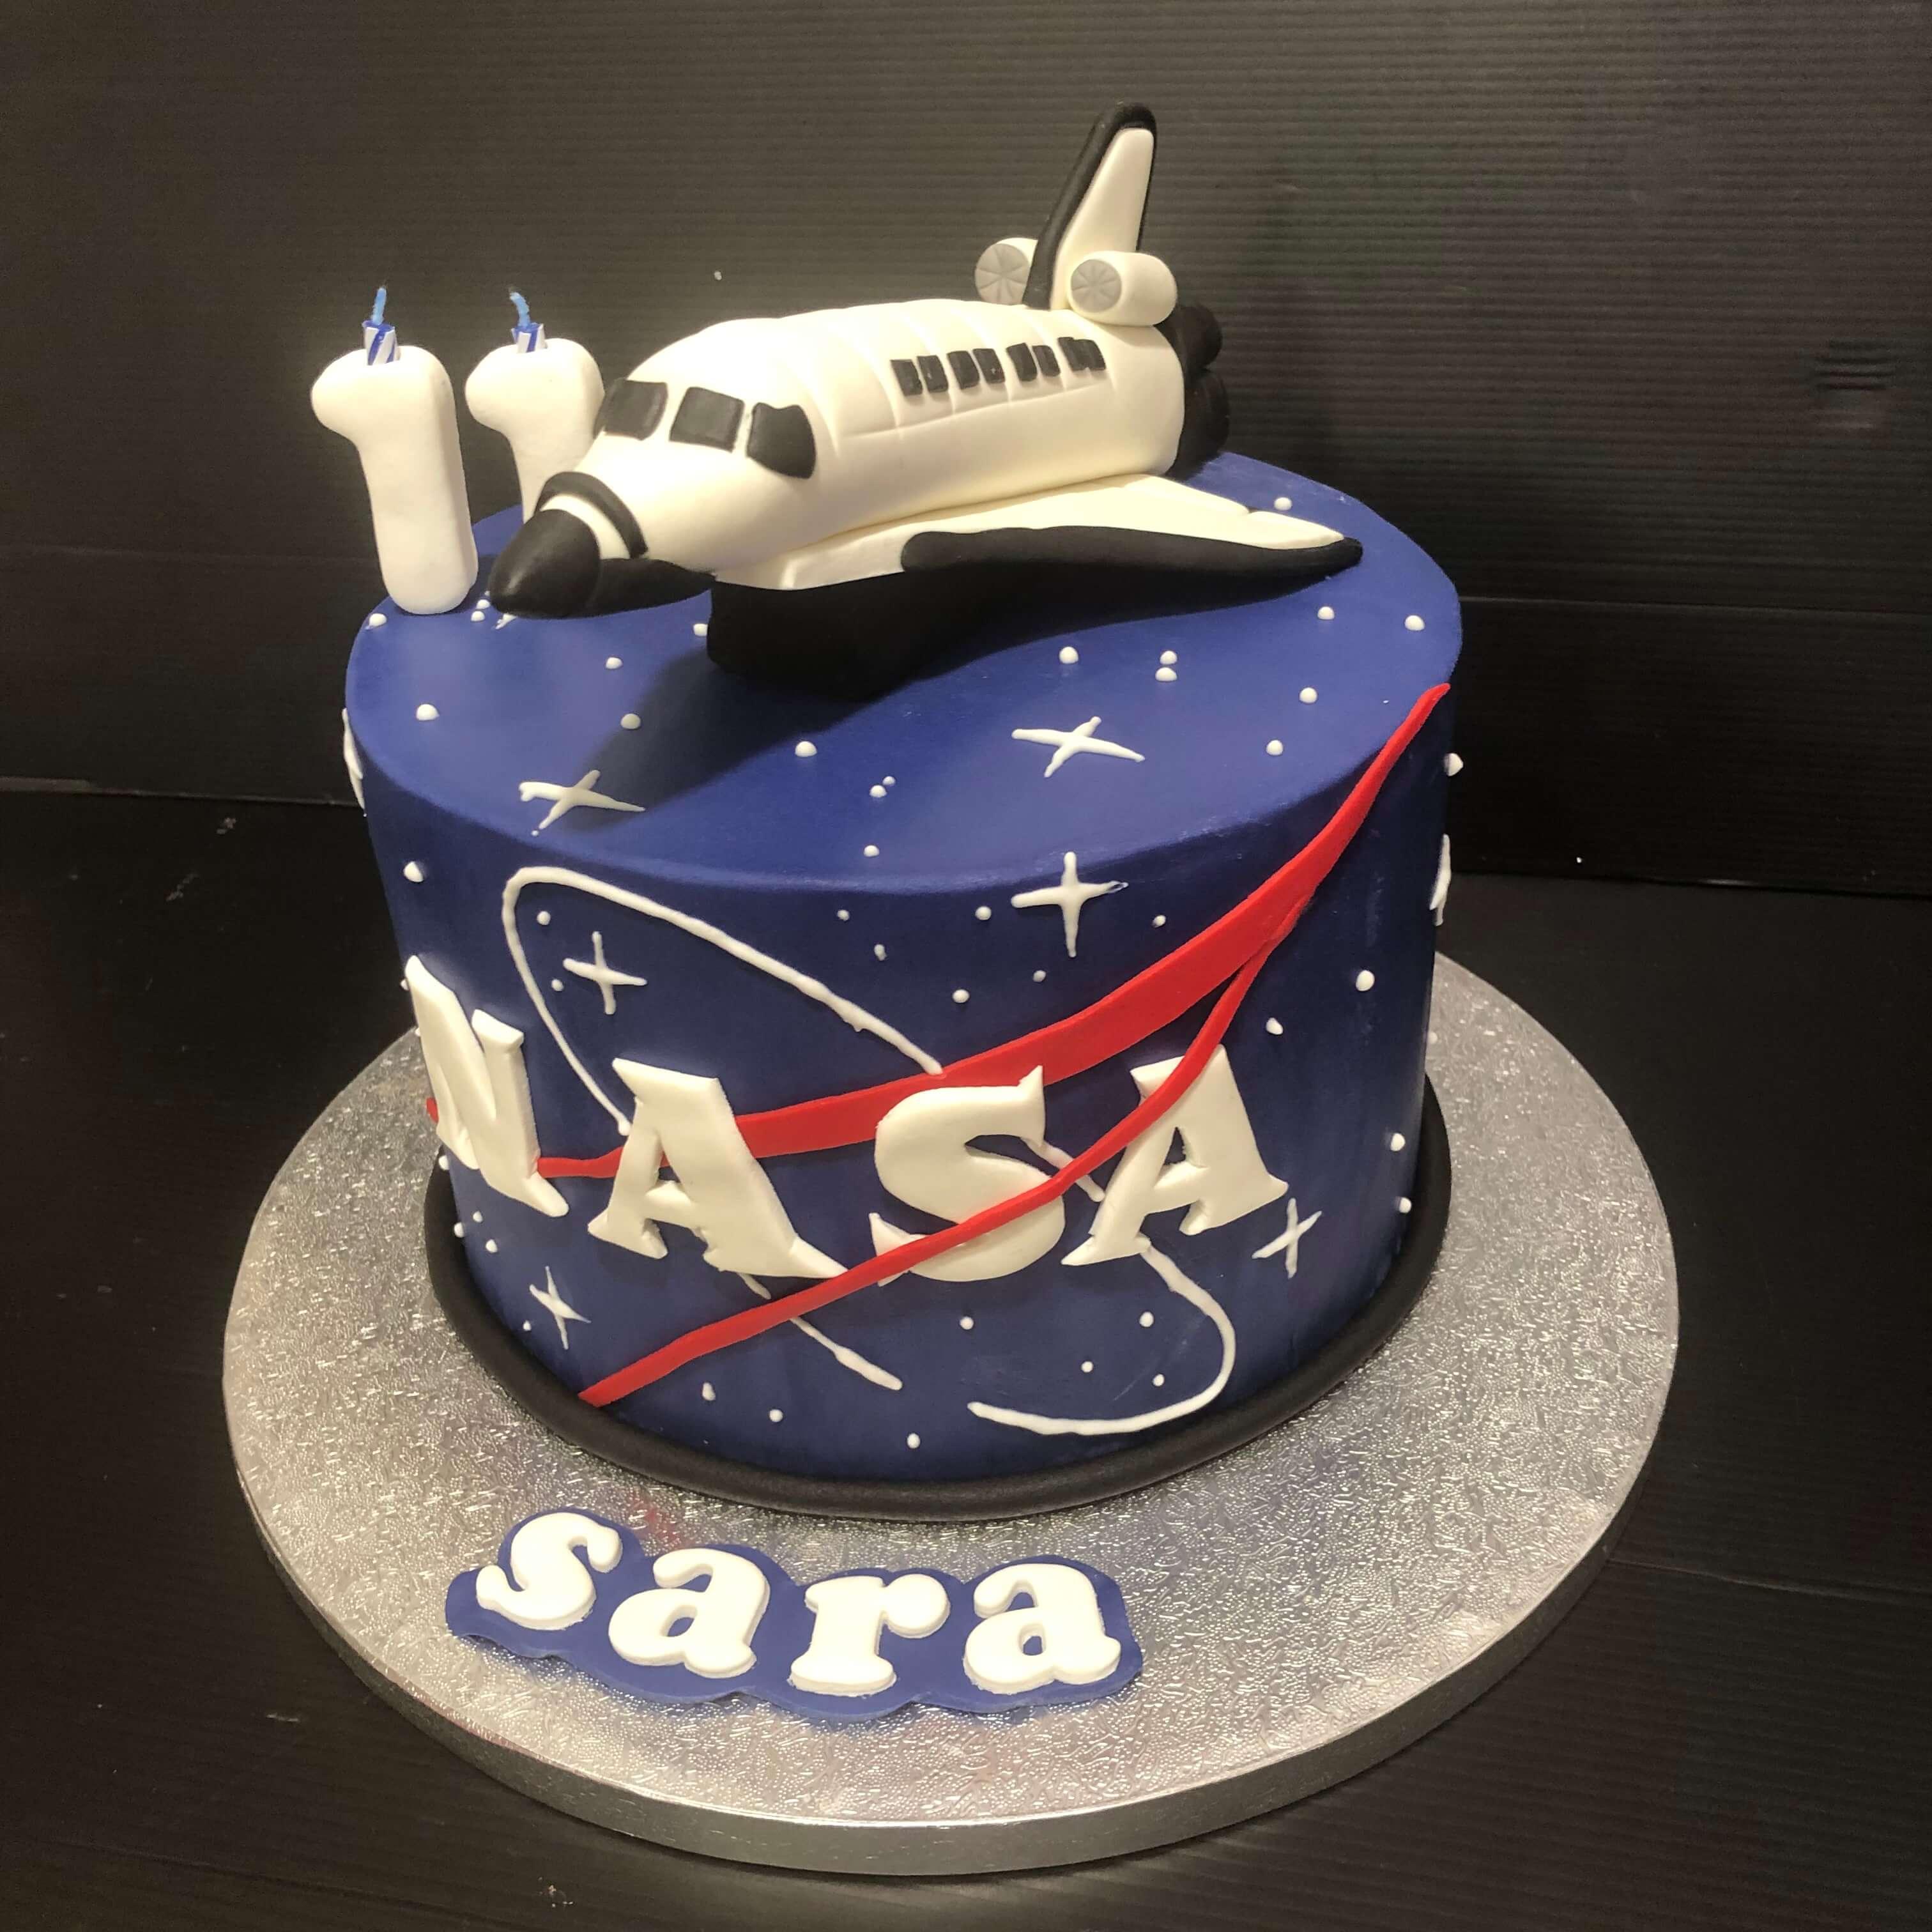 tarta cumpleaños personalizada fondant Nasa astronautas original coruña